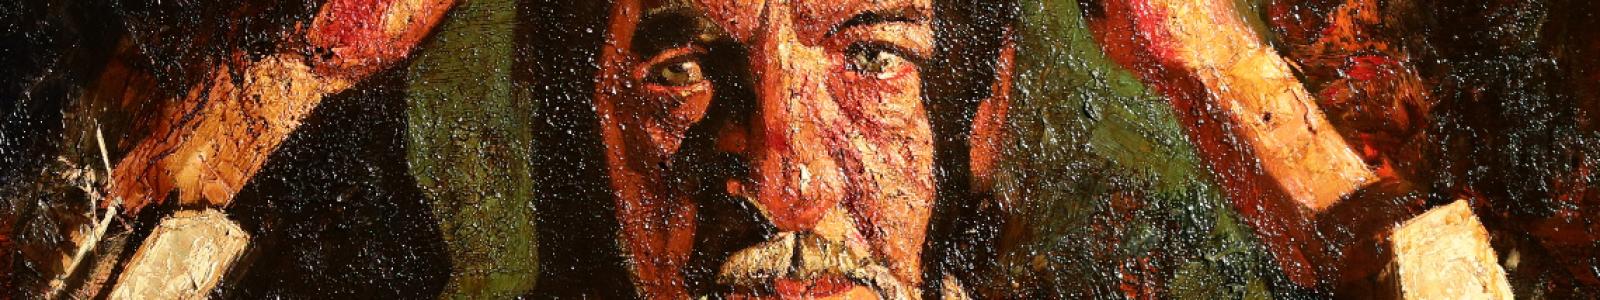 Gallery Painter Areg Mirijanyan